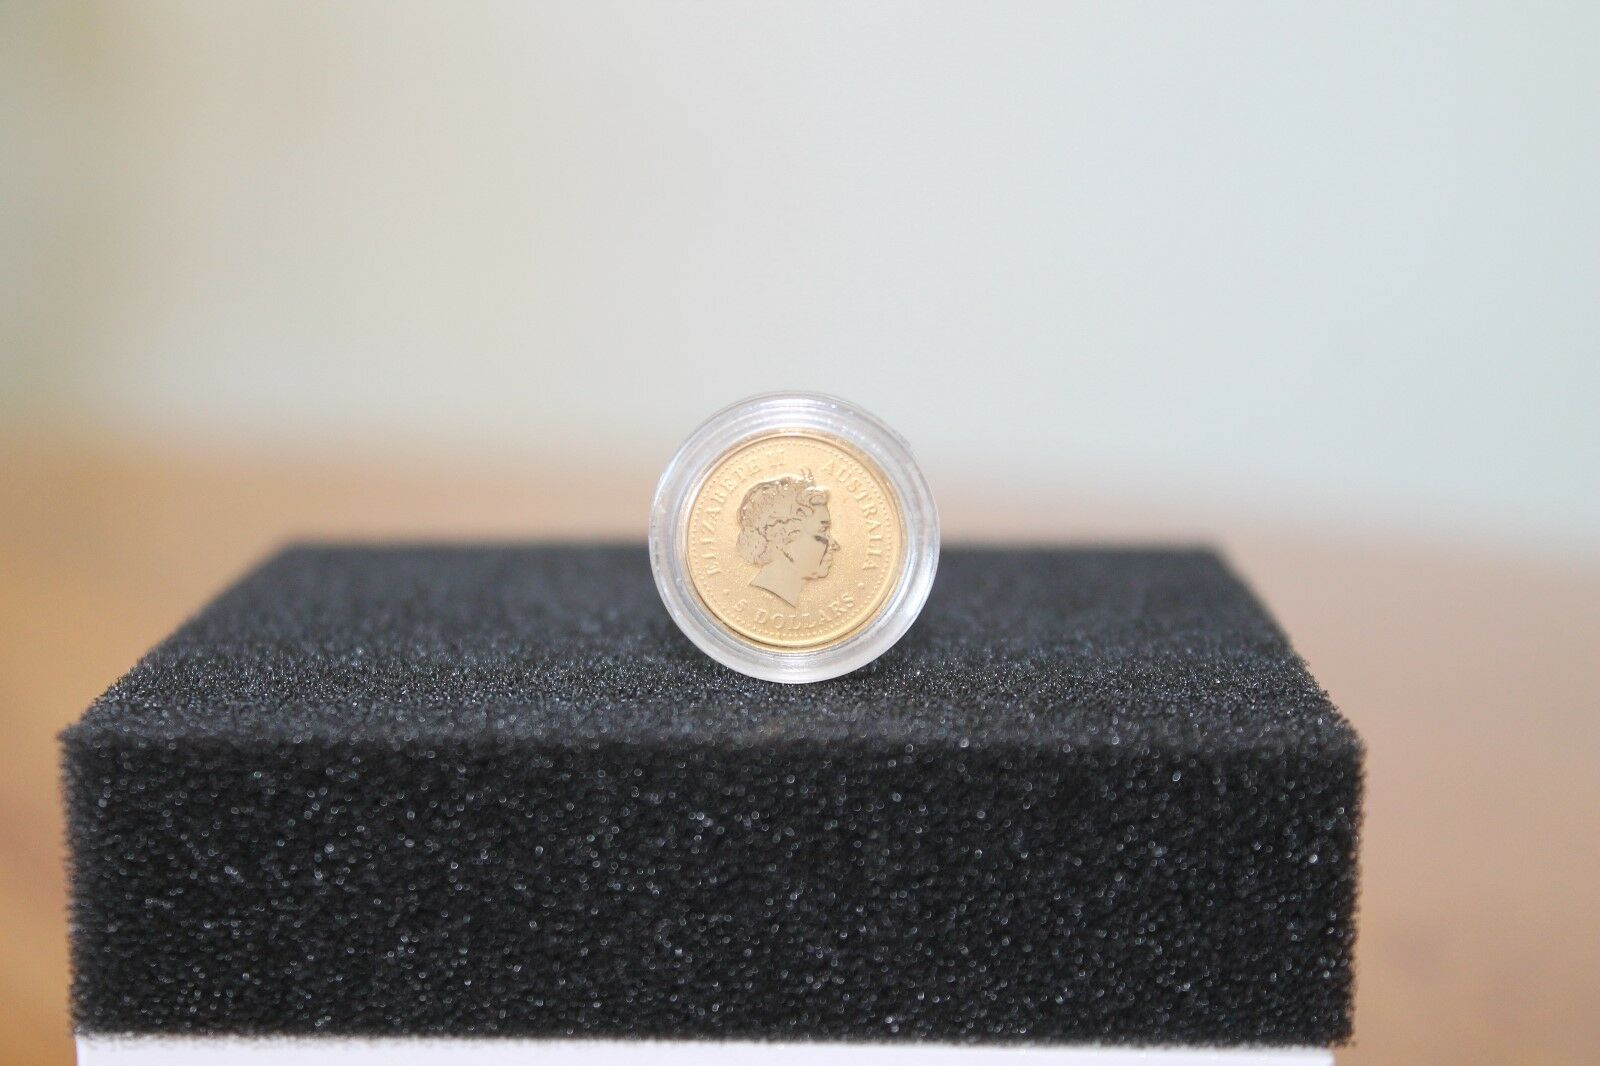 2018-P Australia Year of the Dog 1//20 oz Gold Lunar S2 $5 Coin GEM BU SKU49081